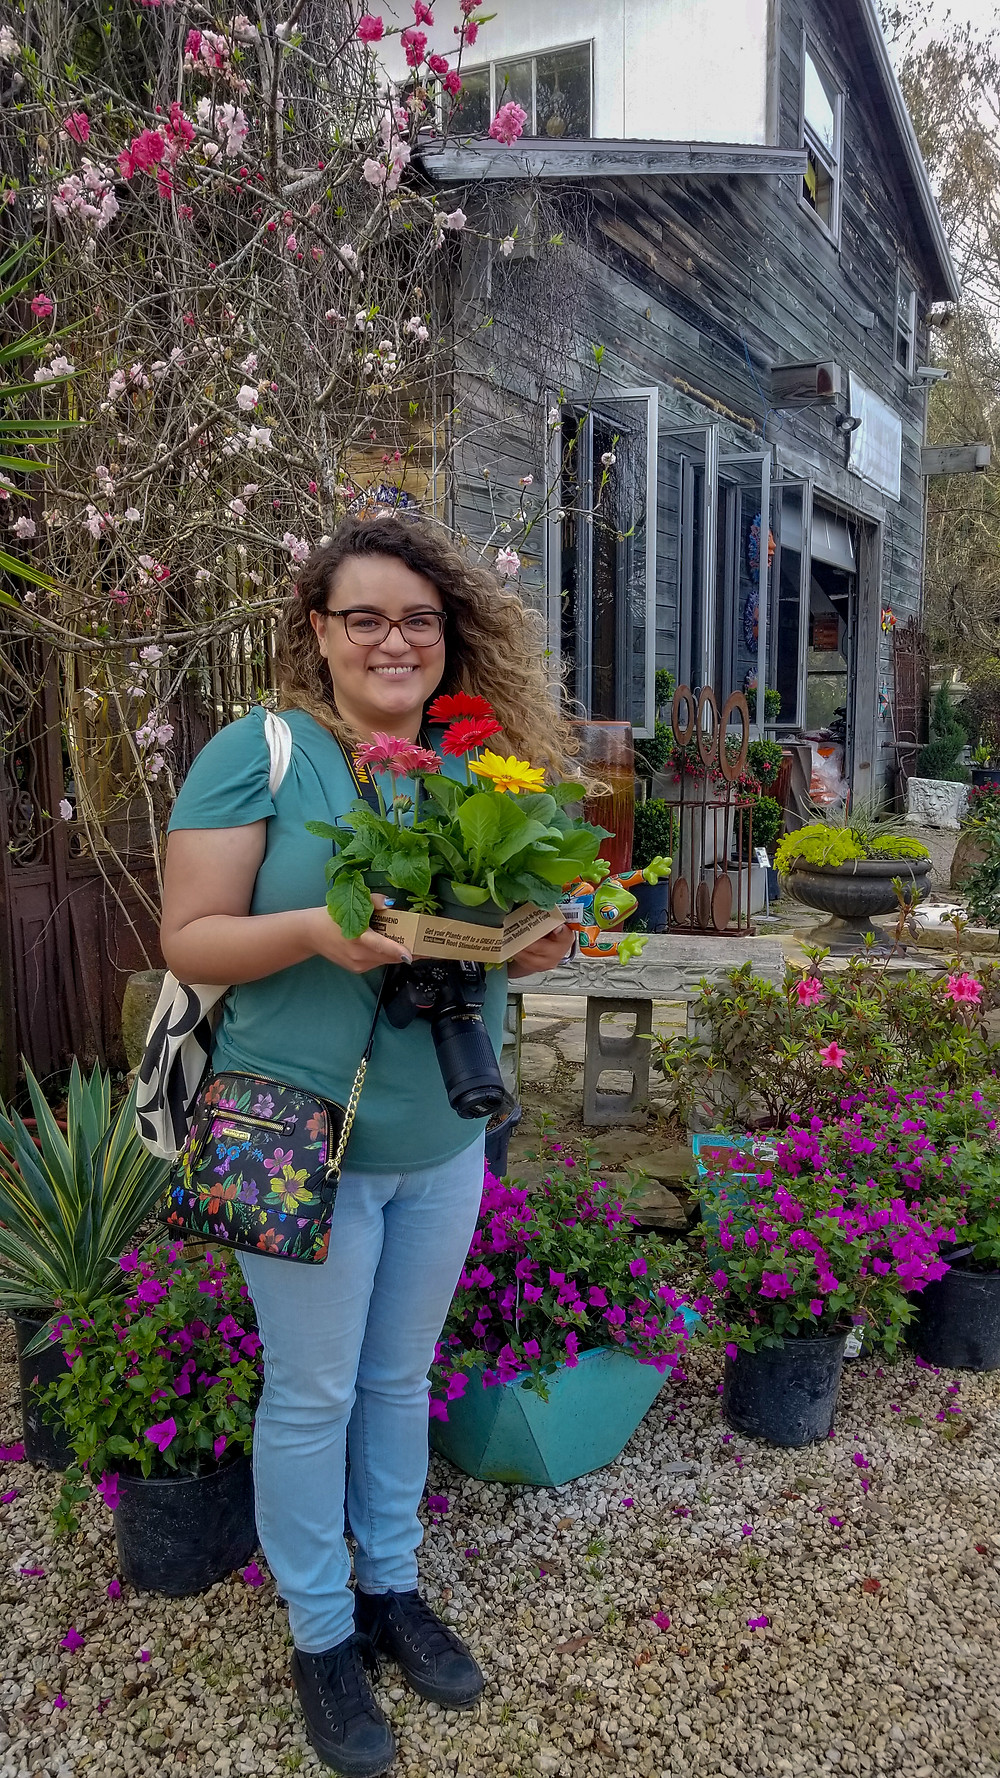 Paloma and the daisies at Maas Nursery in Seabrook, Texas